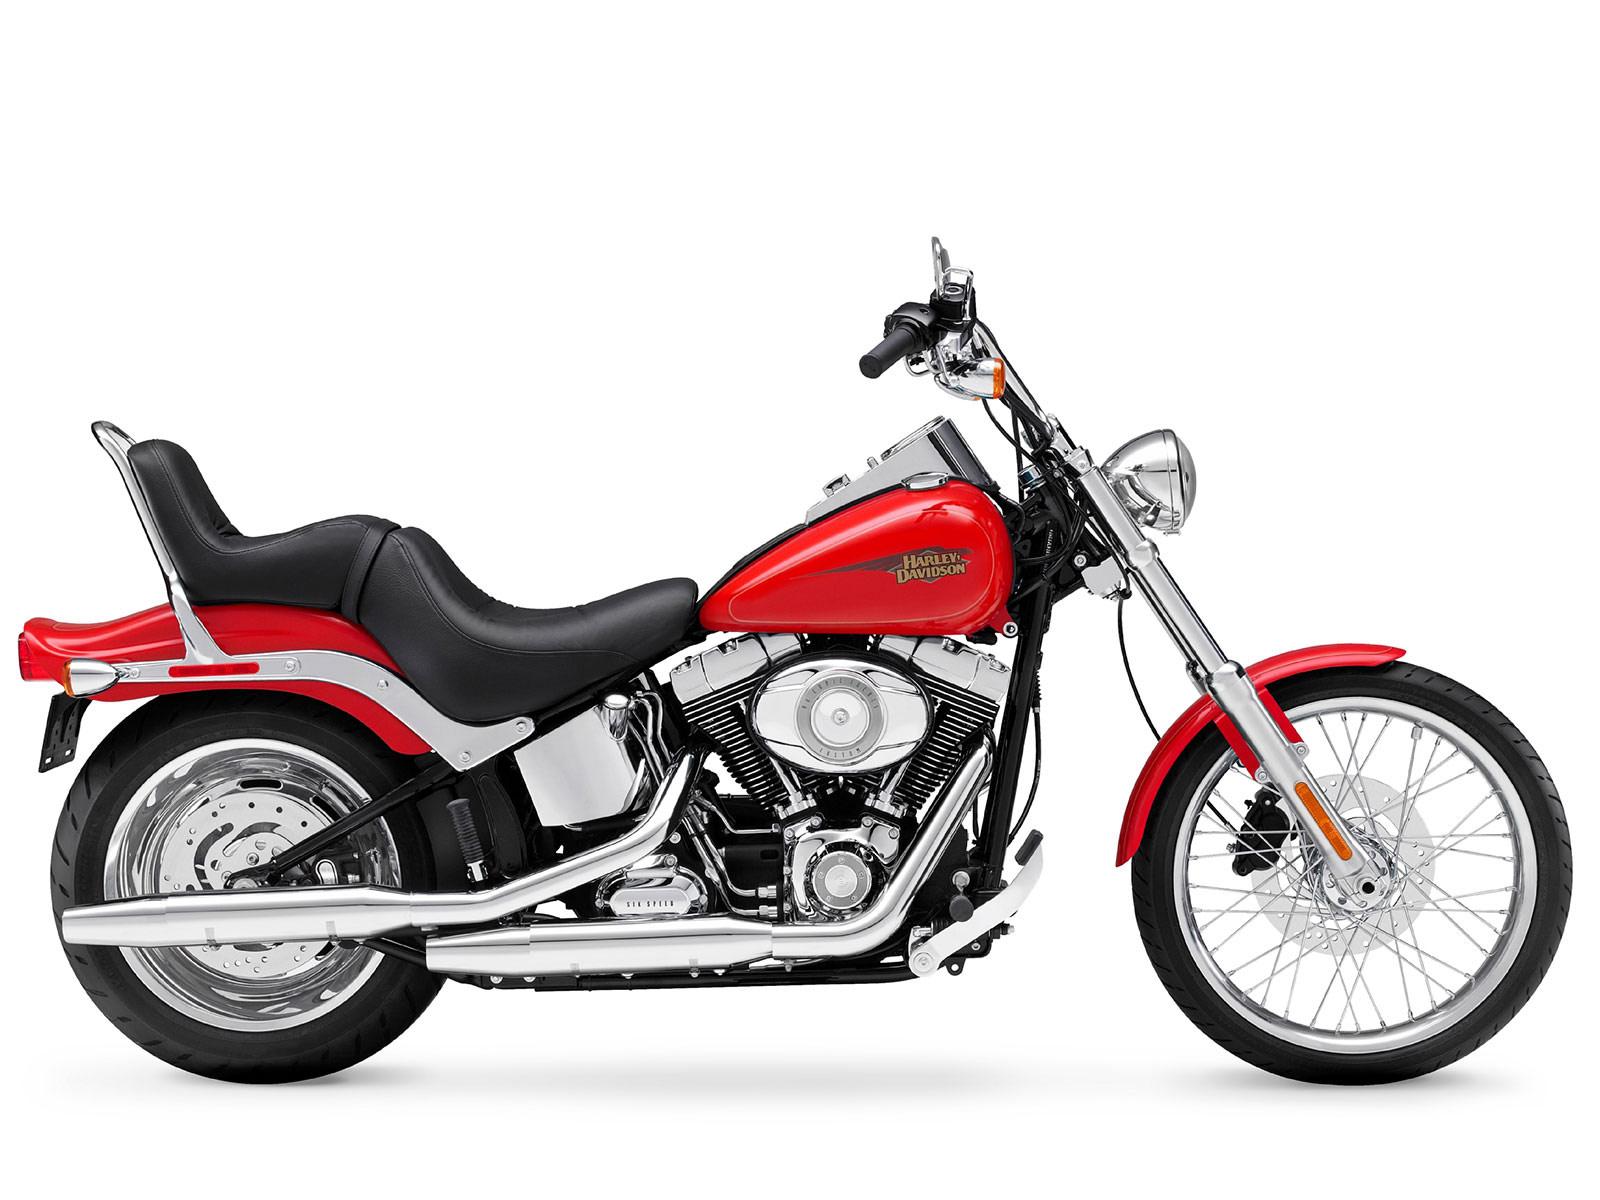 Harley Davidson Softail: 2010 Harley-Davidson FXSTC Softail Custom Pictures